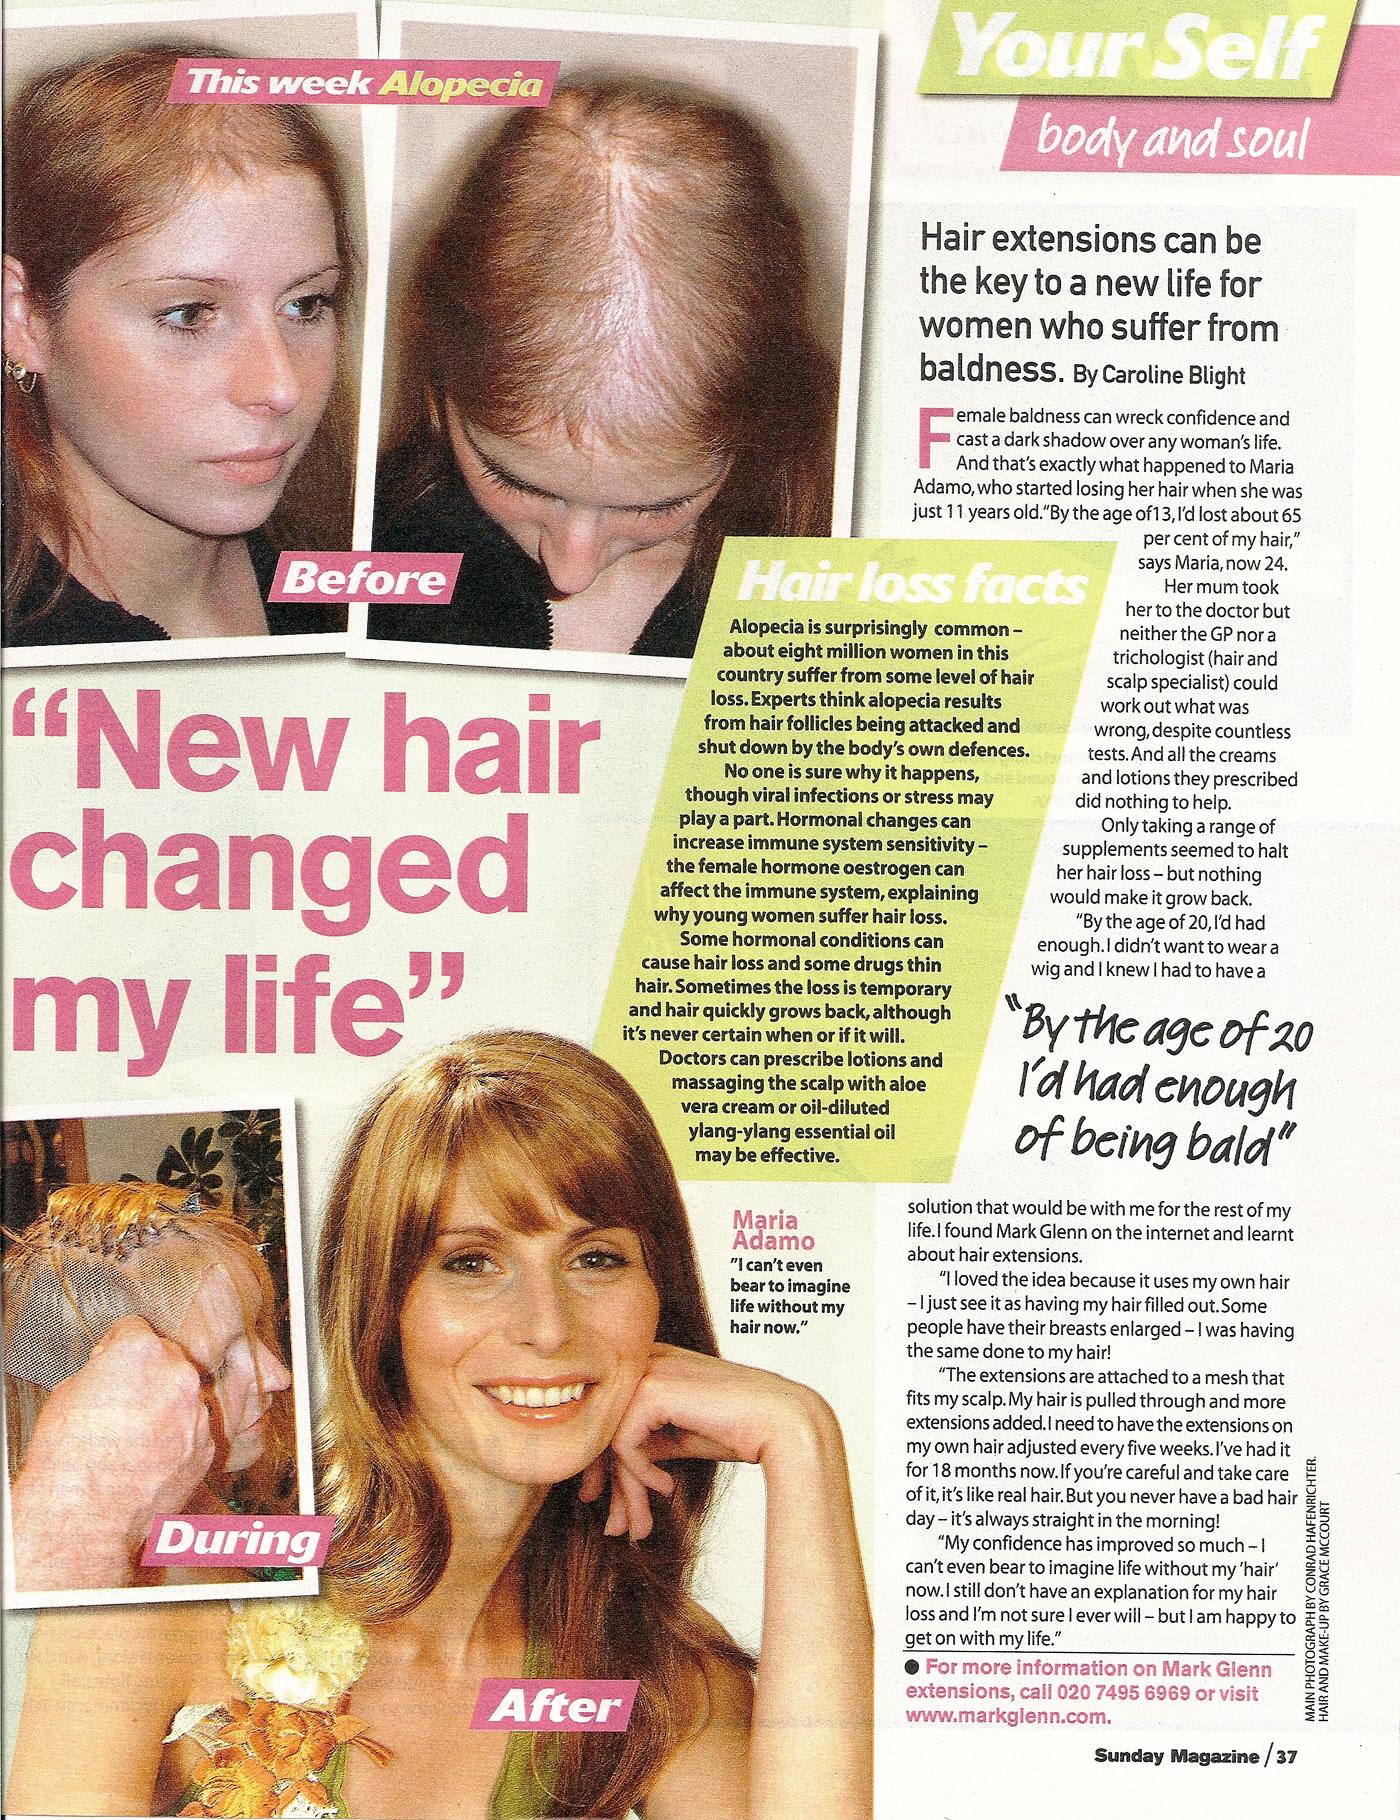 News of the World - 'New Hair at Mark Glenn Changed My Life' - Alopecia